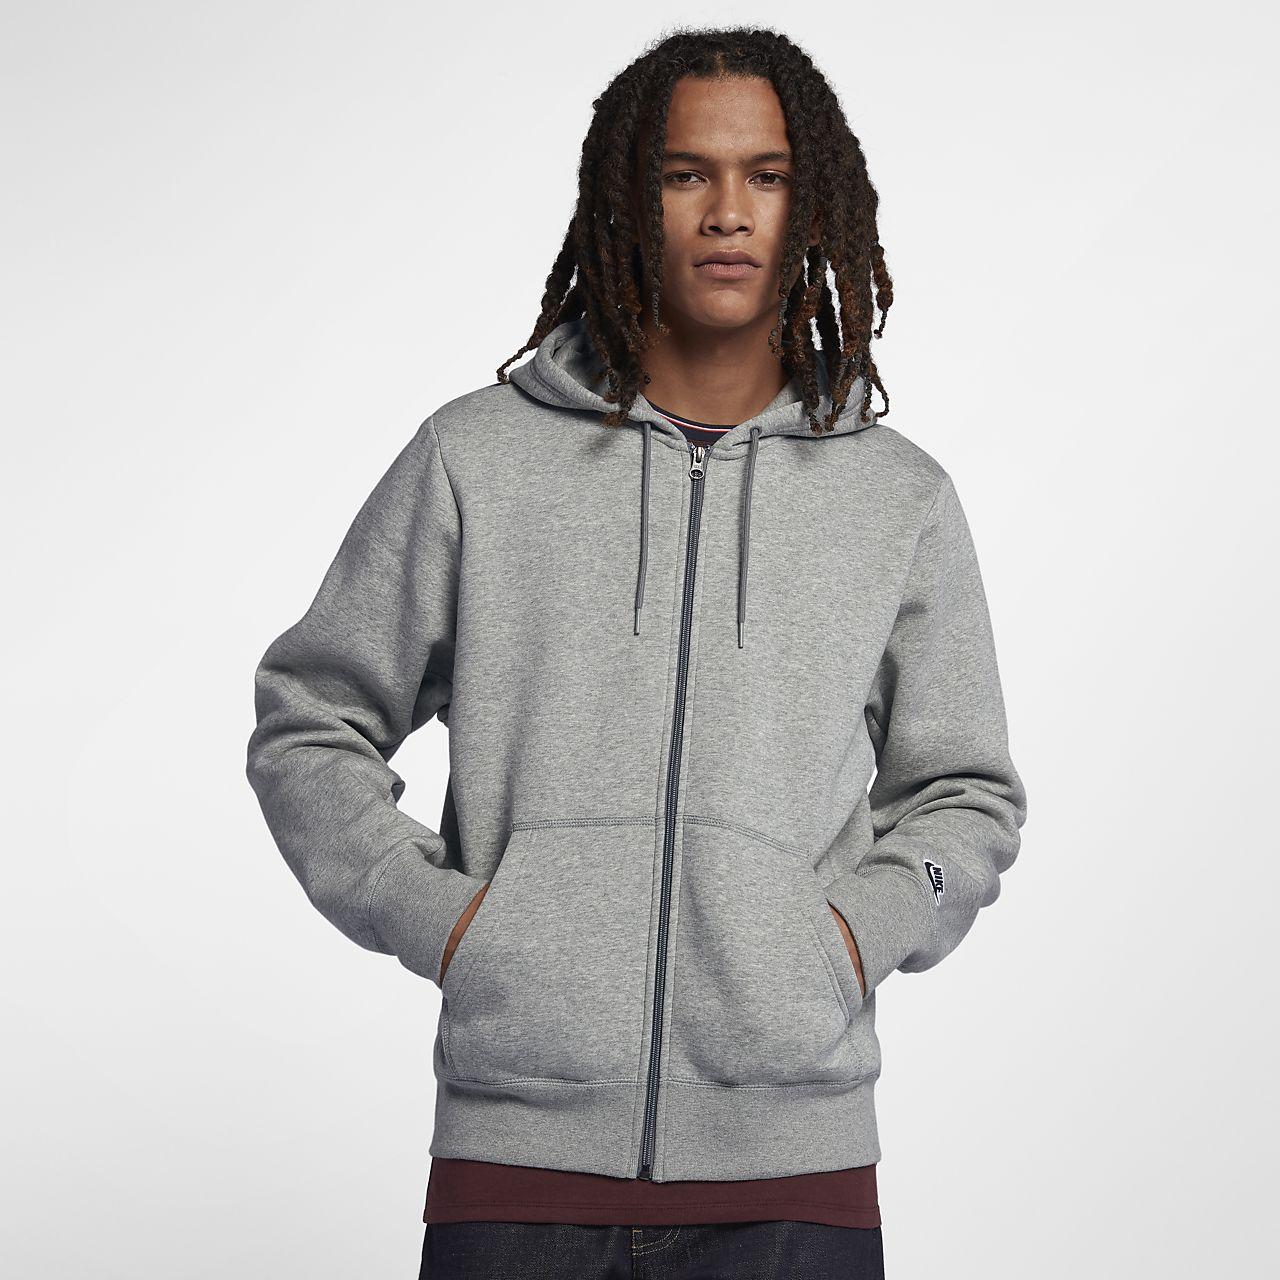 Męska rozpinana bluza z kapturem Nike SB Essential Icon